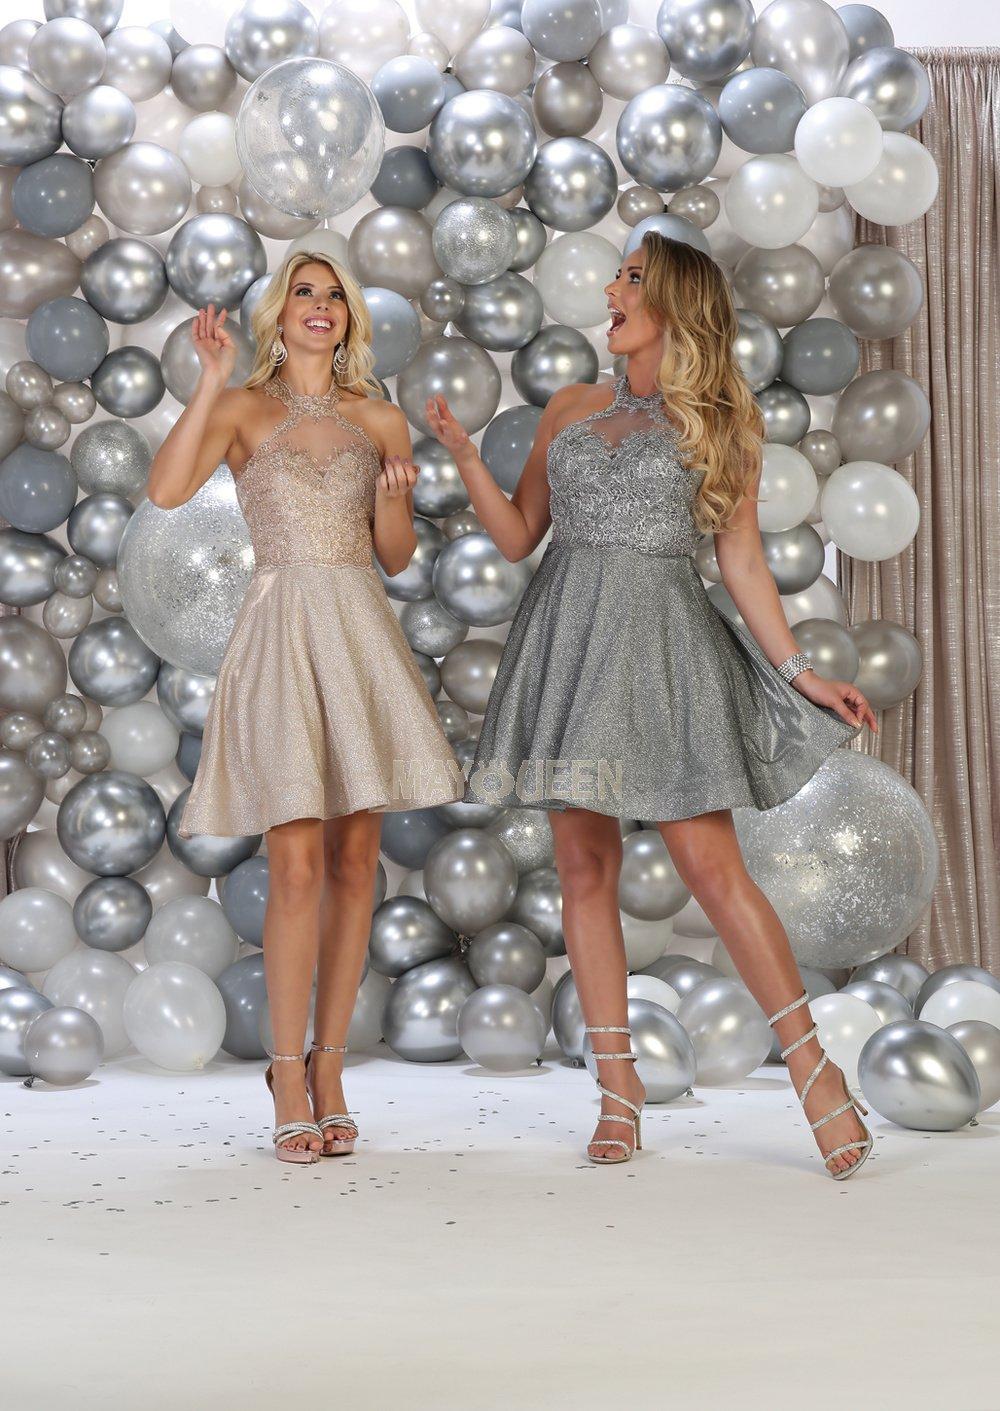 Silver Halter Neck HOCO Dress With Metallic Skirt